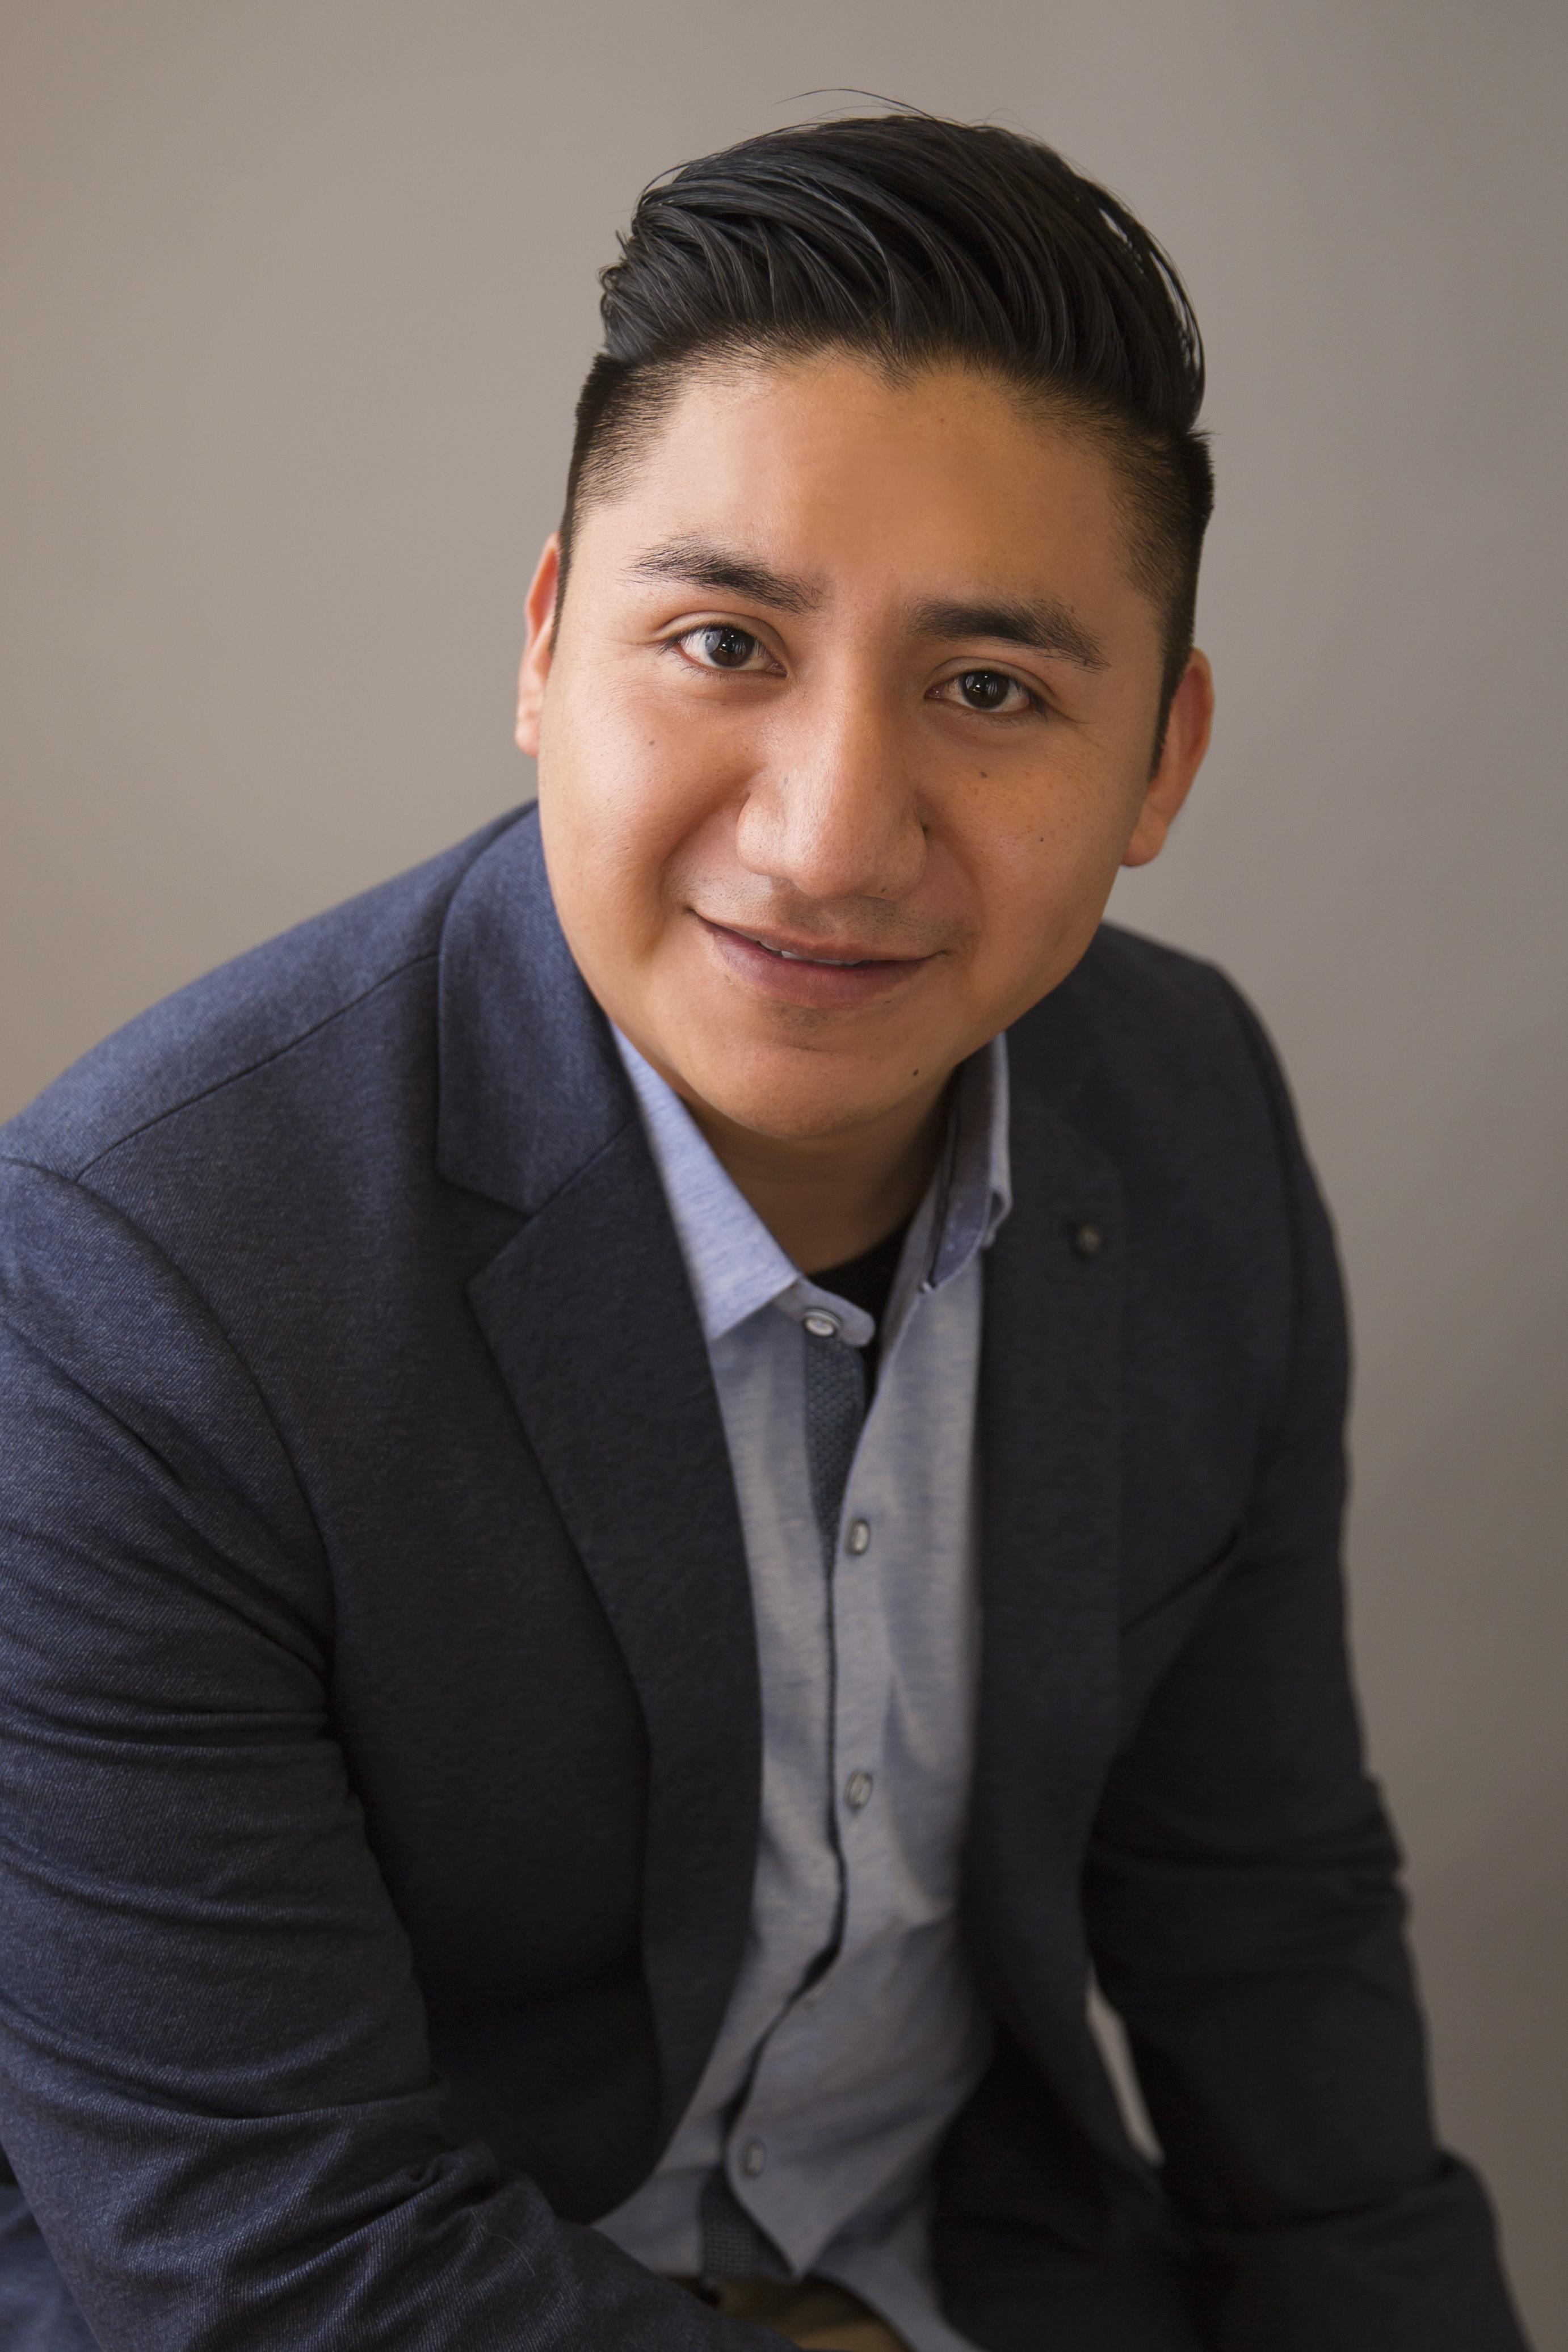 Ben Ramirez Hernandez